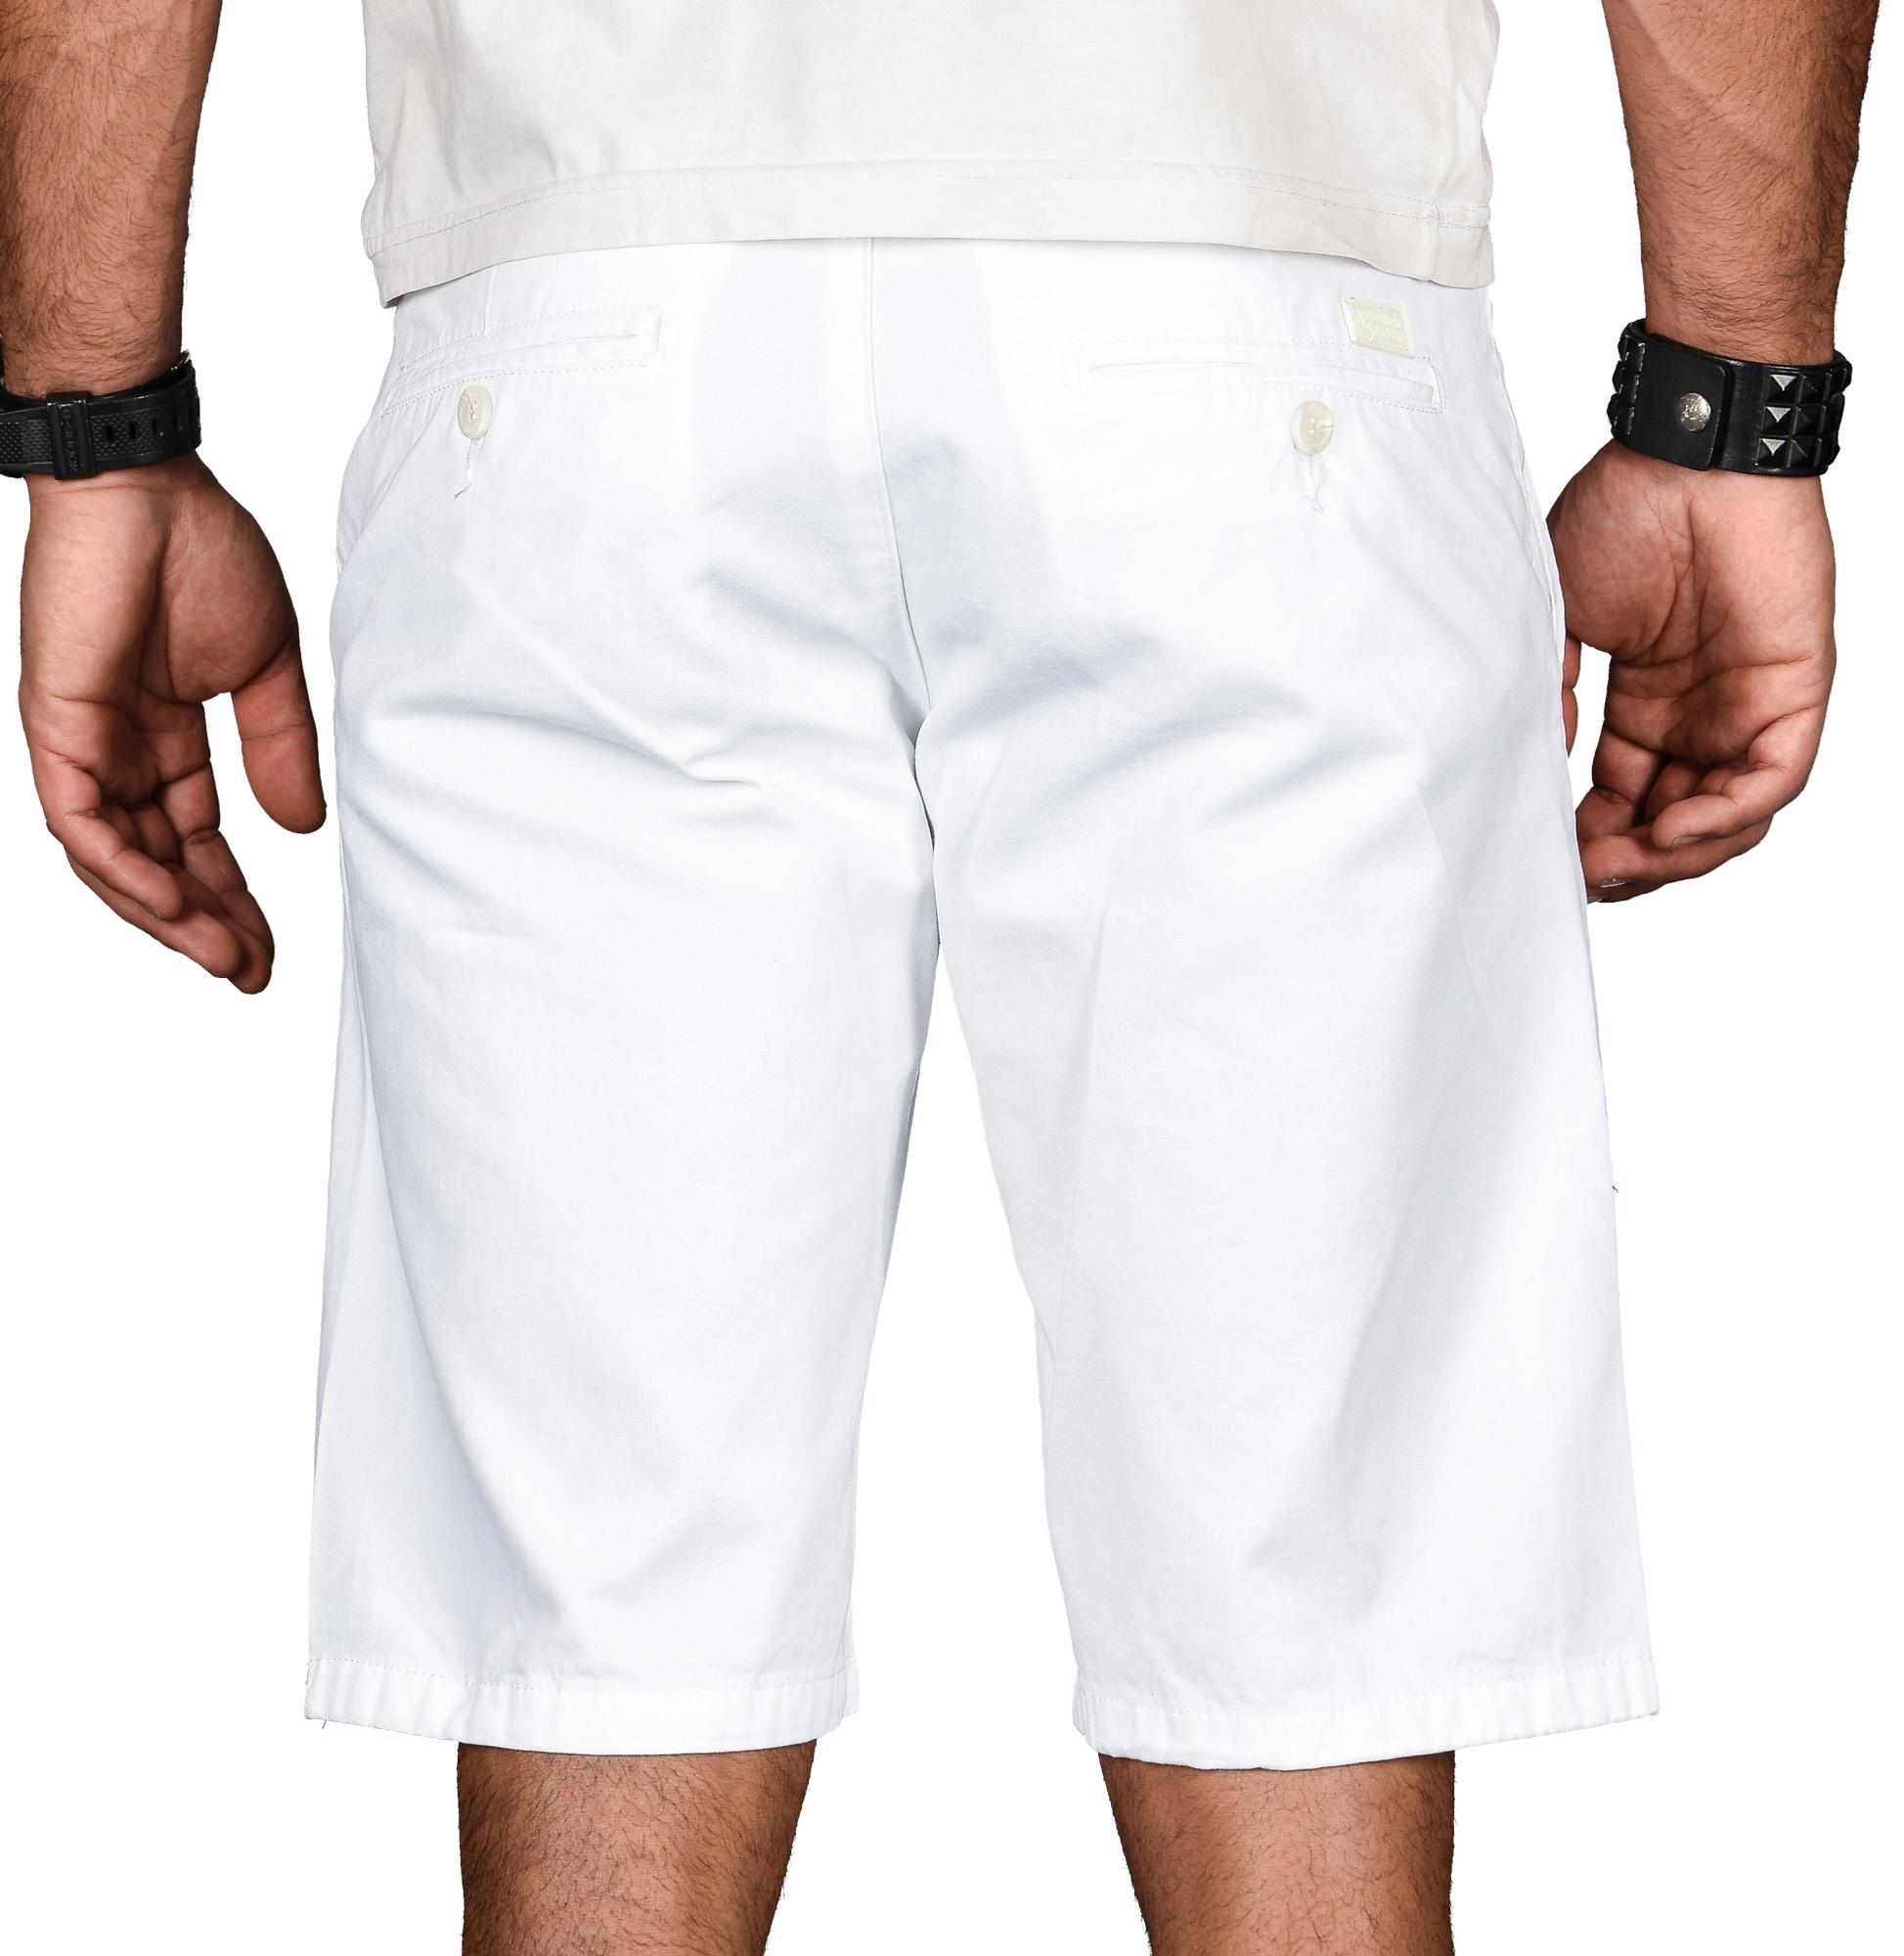 A-Salvarini-Herren-Shorts-kurze-Sommer-Hose-mit-Guertel-Short-Bermuda-NEU-AS096 Indexbild 24